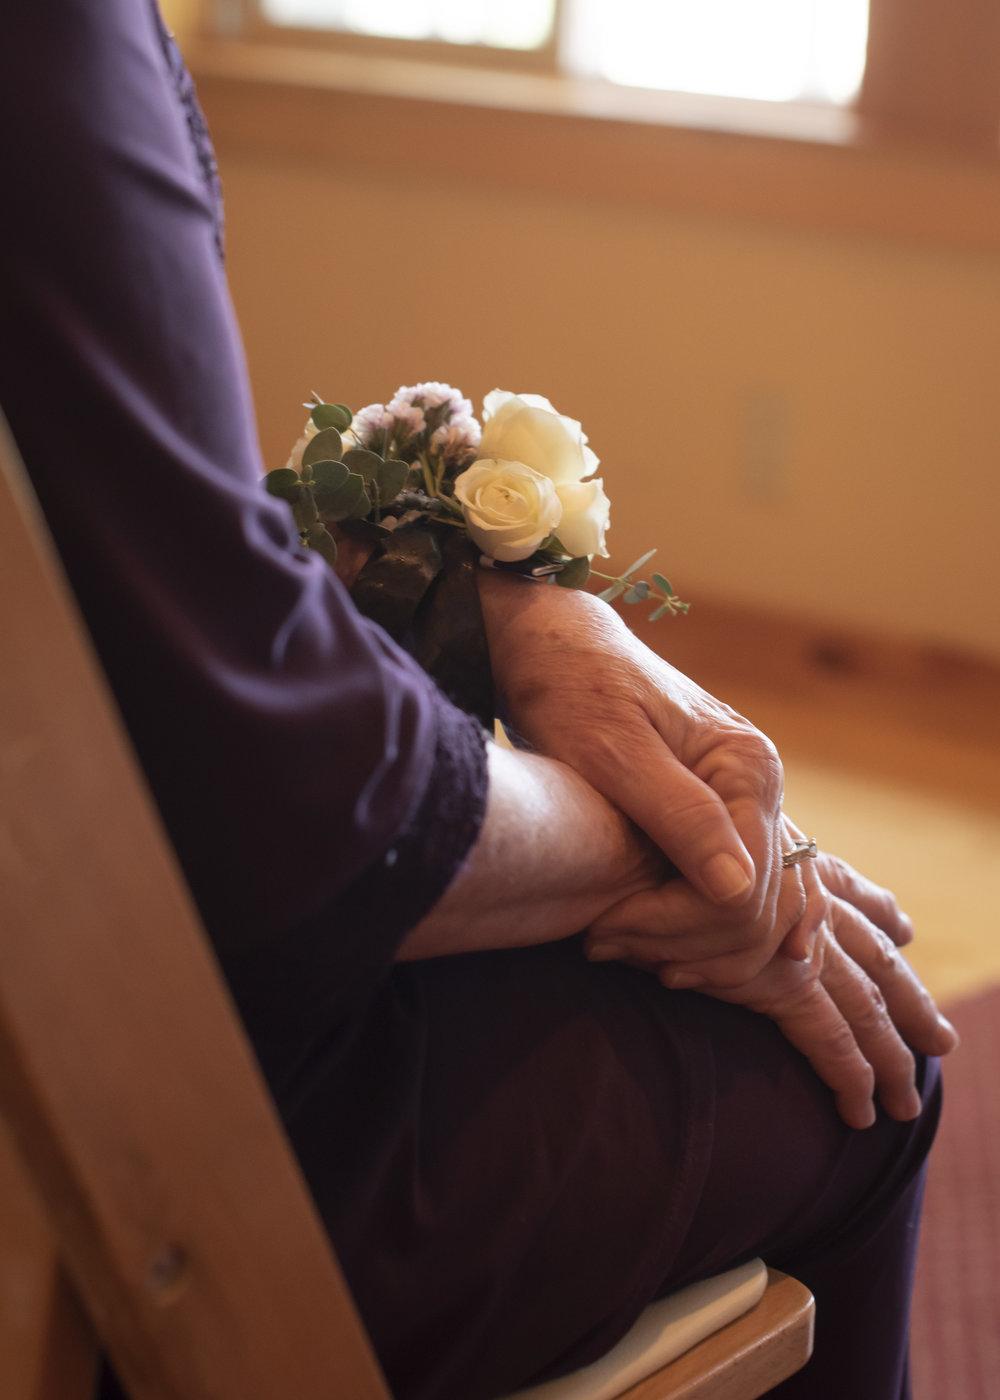 Bend Floral Photo Wild Tea Cup - Family Flowers - Wrist Corsage - Sunriver.JPG